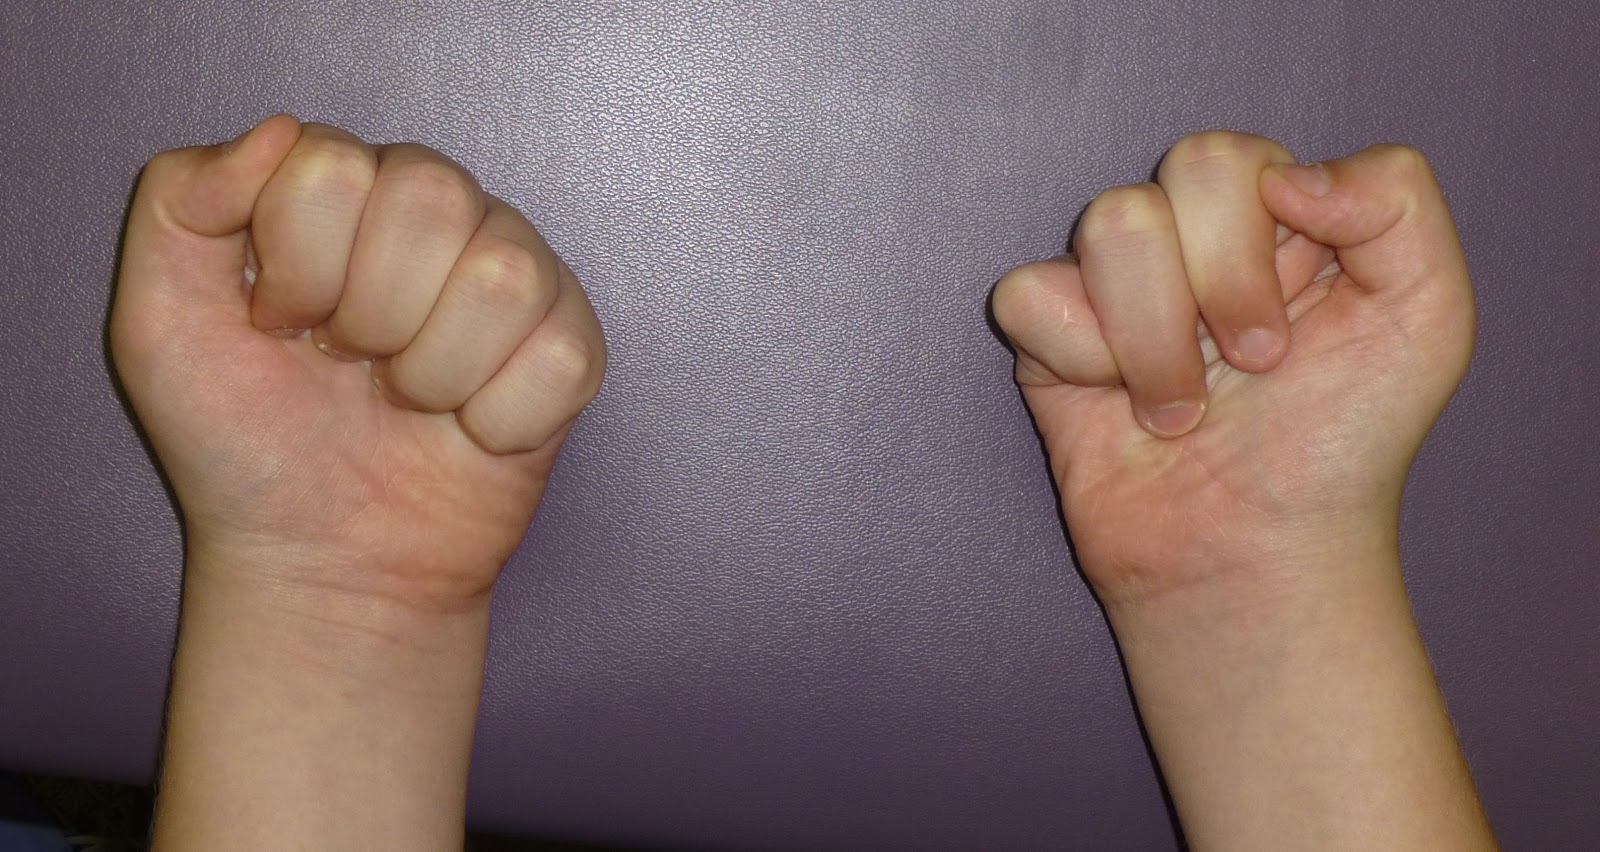 http://1.bp.blogspot.com/-CAkHo2M7XWg/UZf5eDmXJxI/AAAAAAAAAlI/IH_31FLOdXc/s1600/cleft+fist.jpg